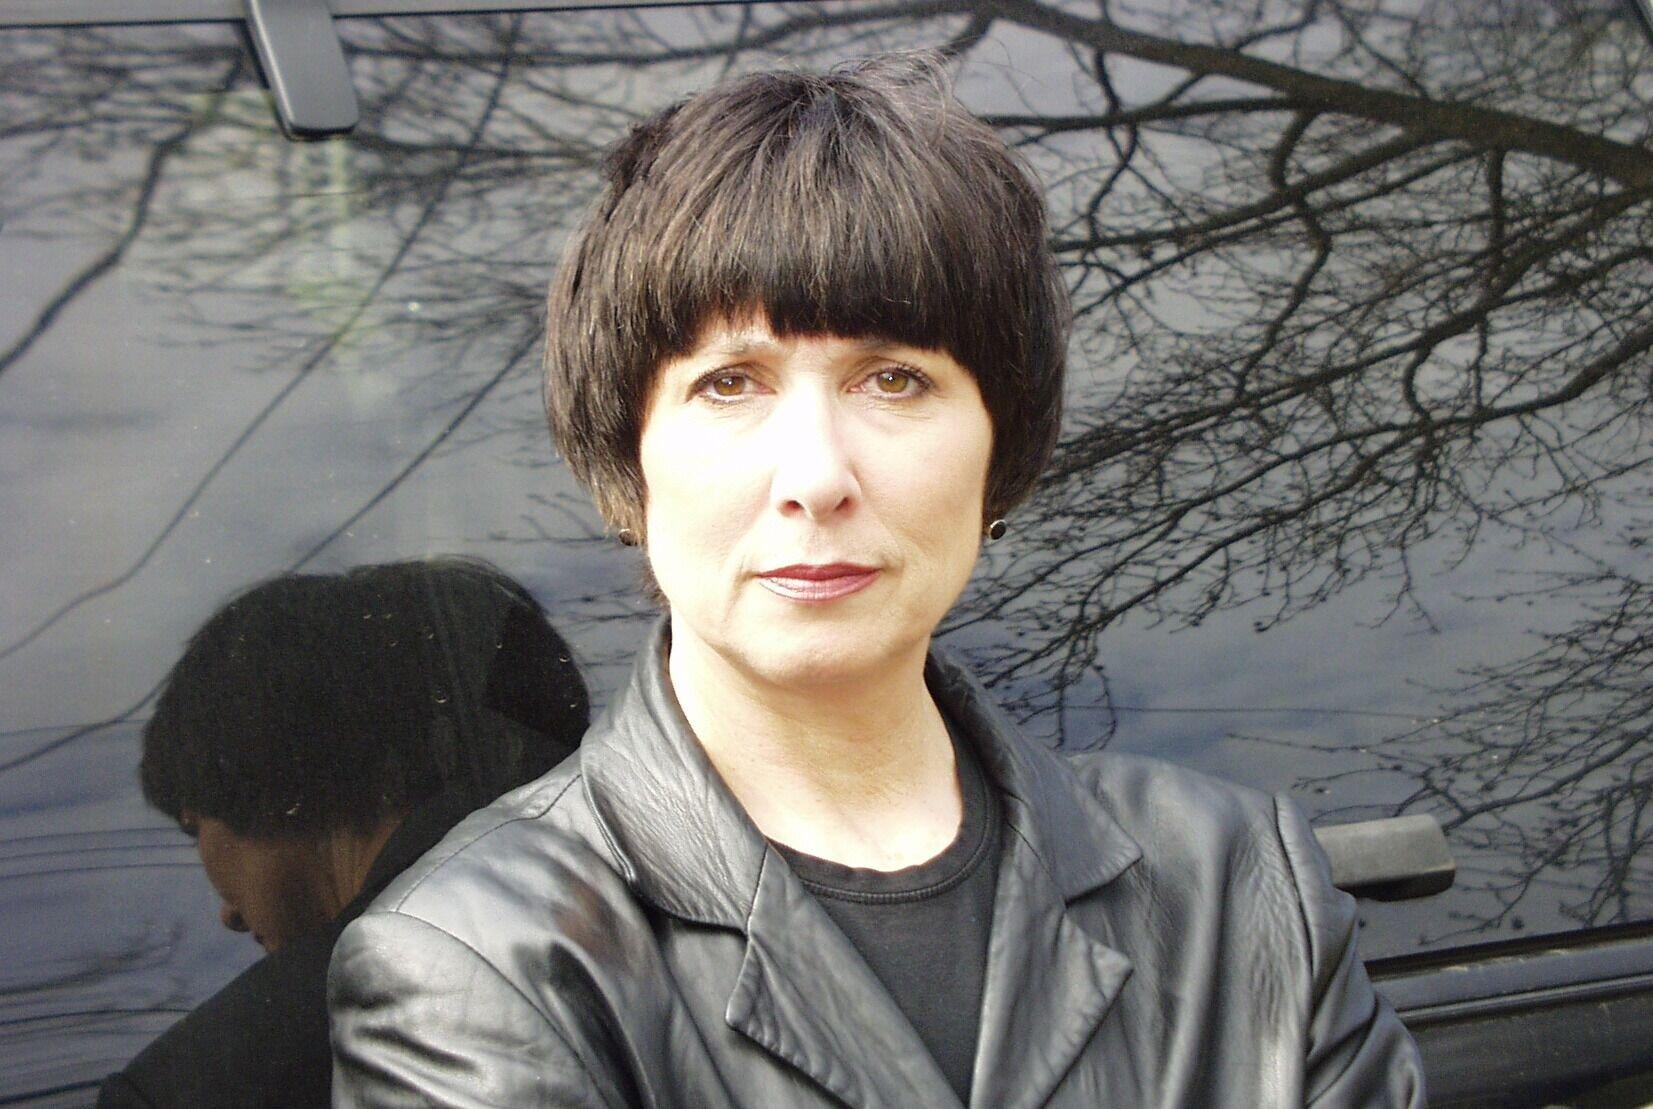 Jane Steuerwald will present award-winning shorts from the Black Maria Film Festival at Film Days.